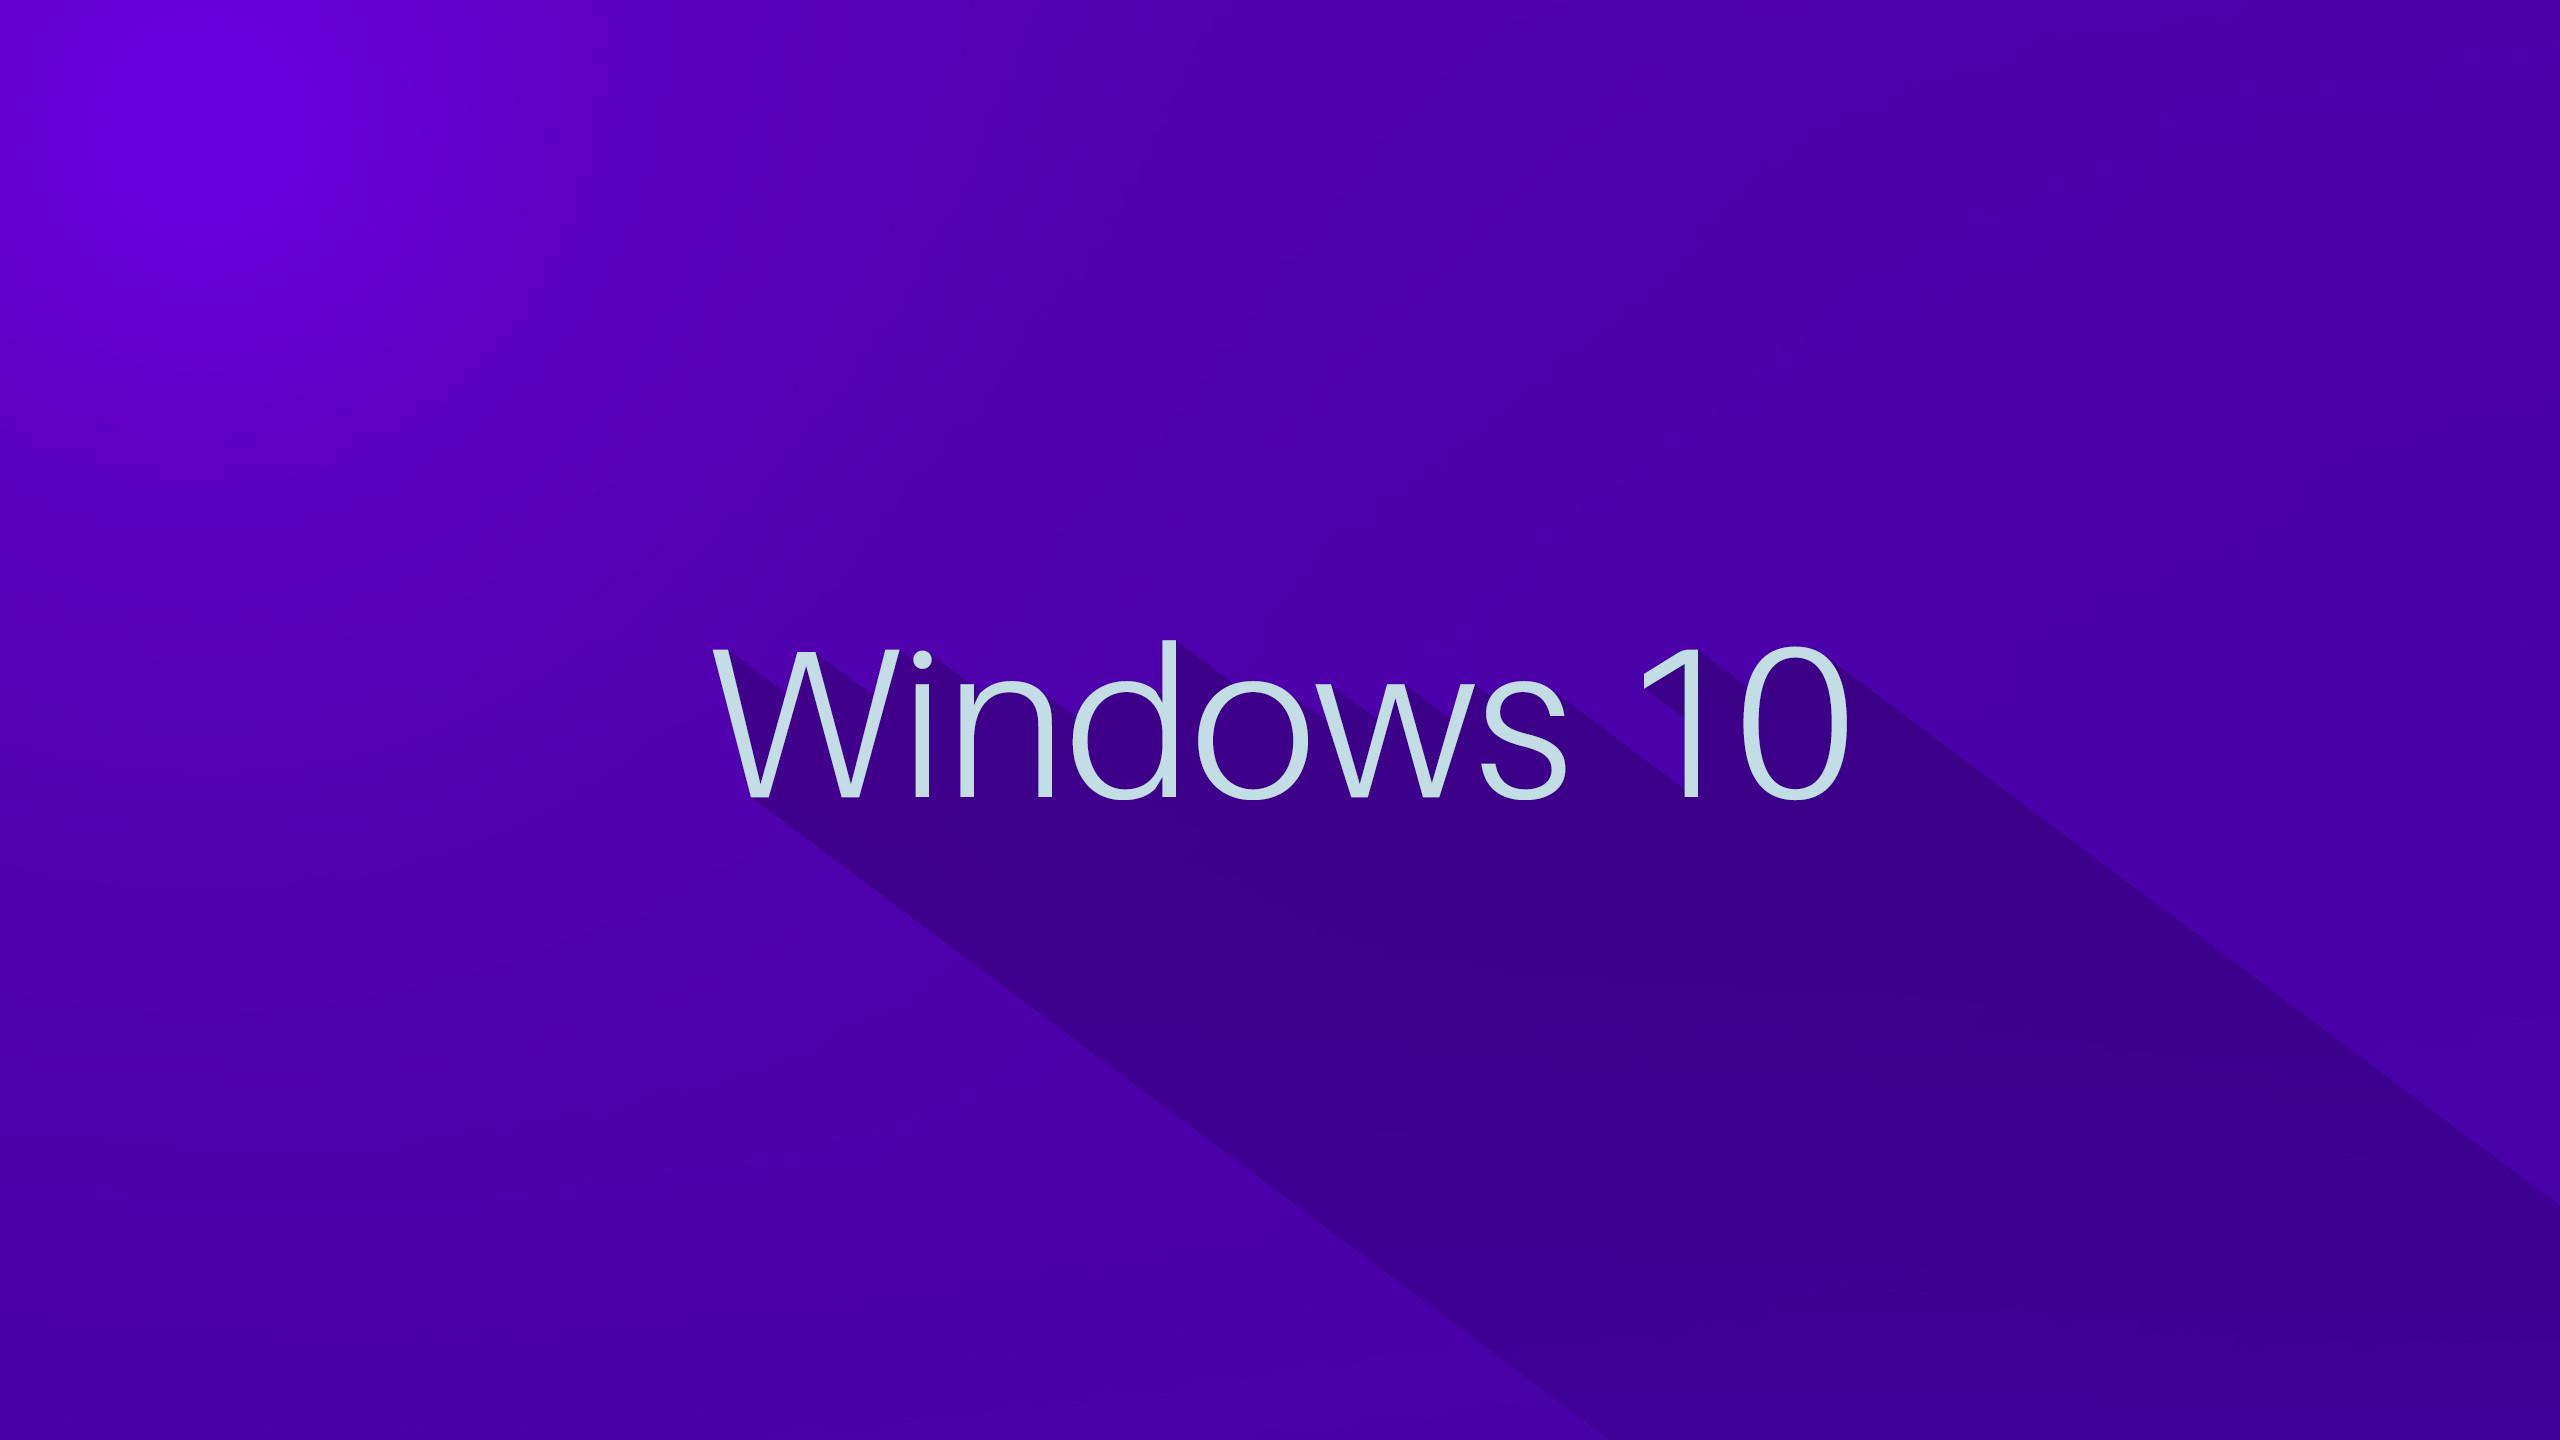 Purple Windows 10 Wallpaper Background 49913